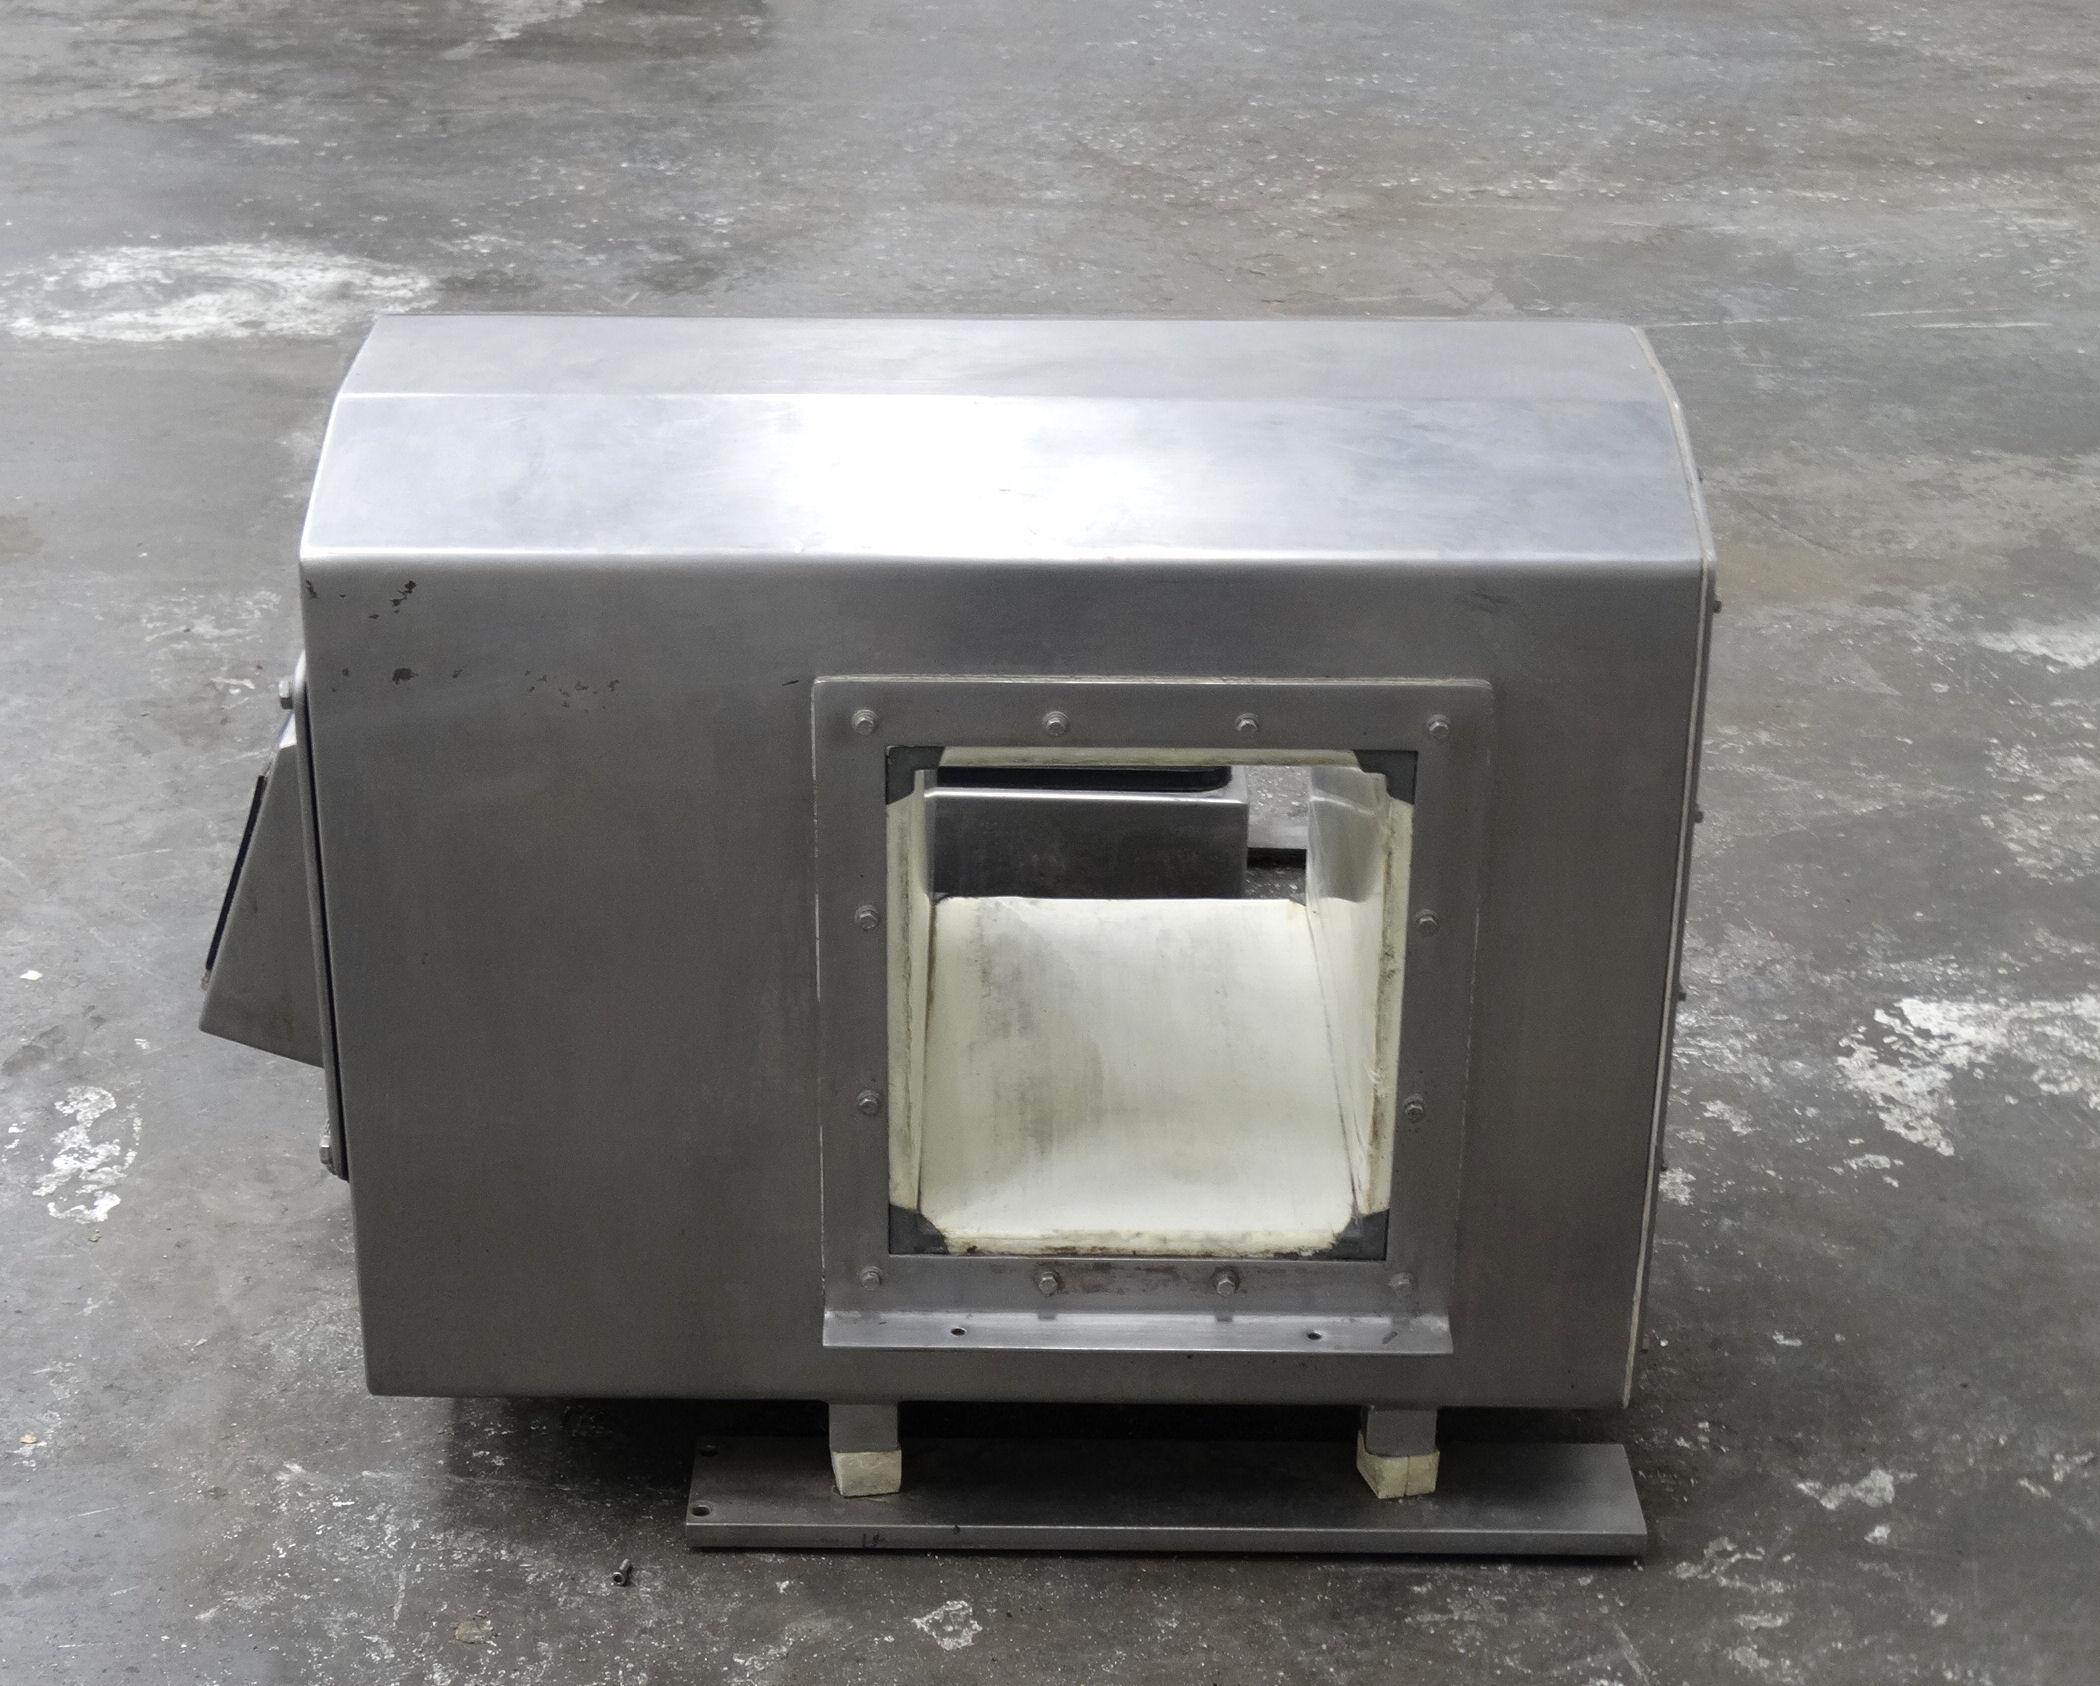 "Safeline Metal Detector Head 7.75""W x 7""H Opening B2157 - Image 4 of 8"